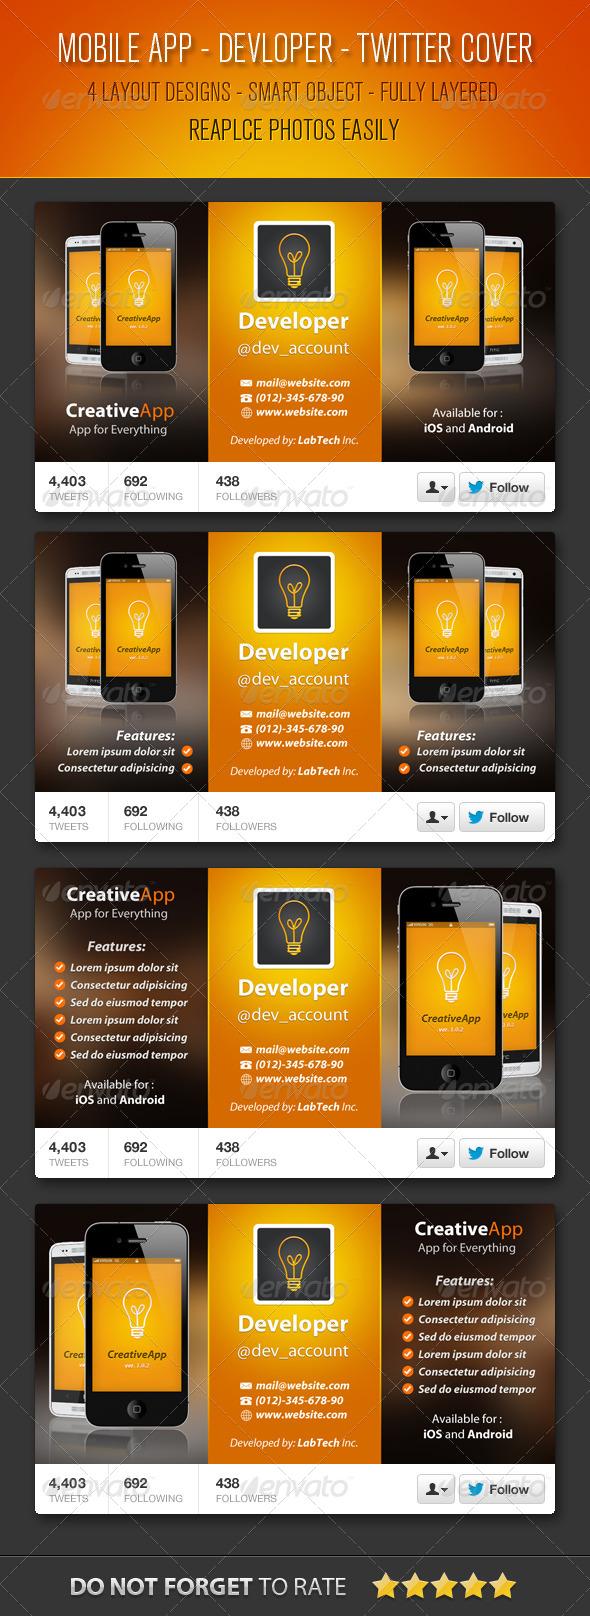 GraphicRiver Mobile App Developer Twitter Cover 5528777